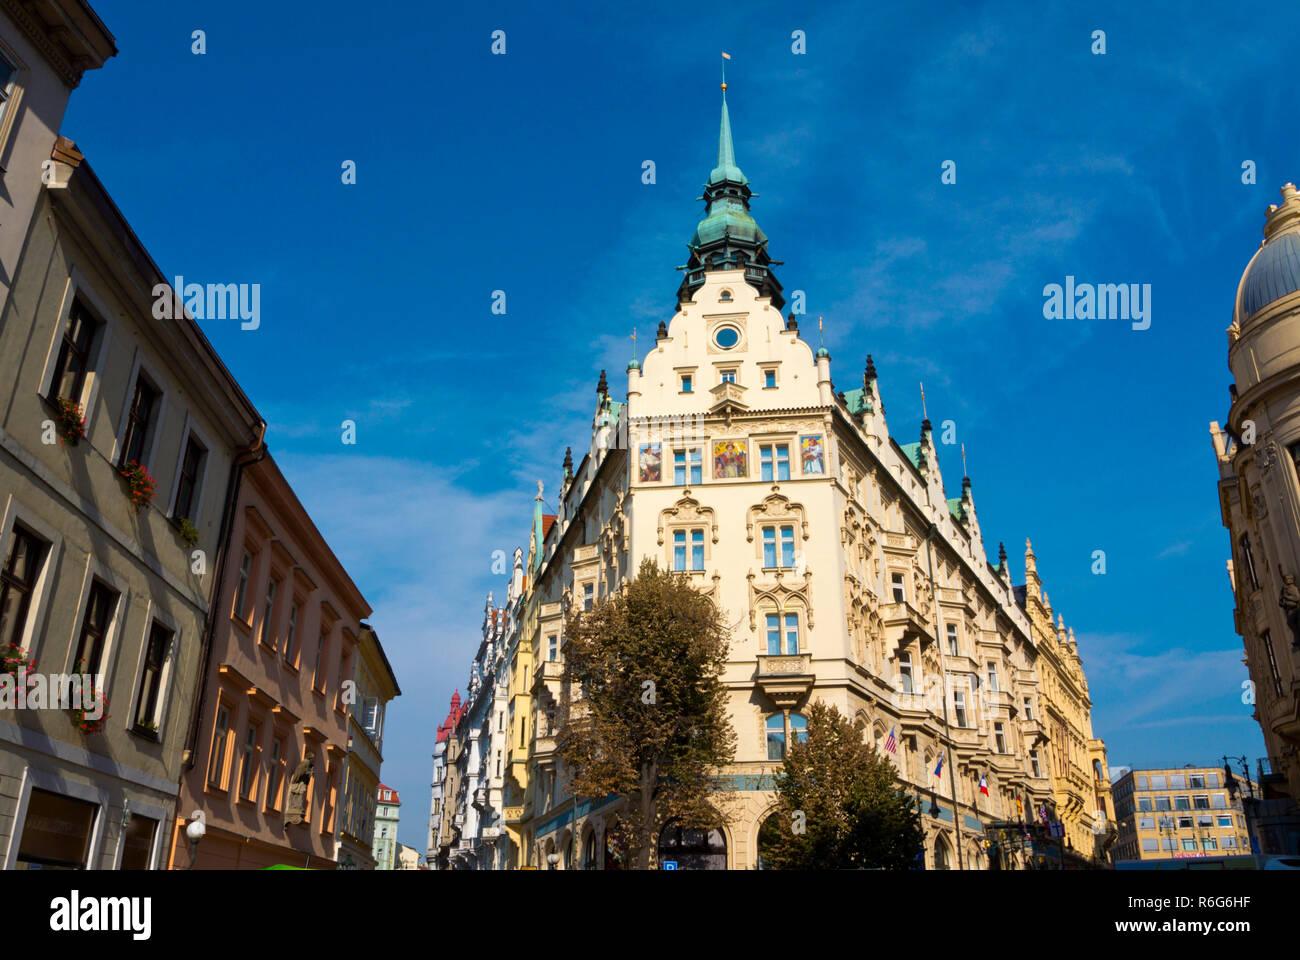 Hotel Paris Prague, in a building from 1904, old town, Prague, Czech Republic - Stock Image